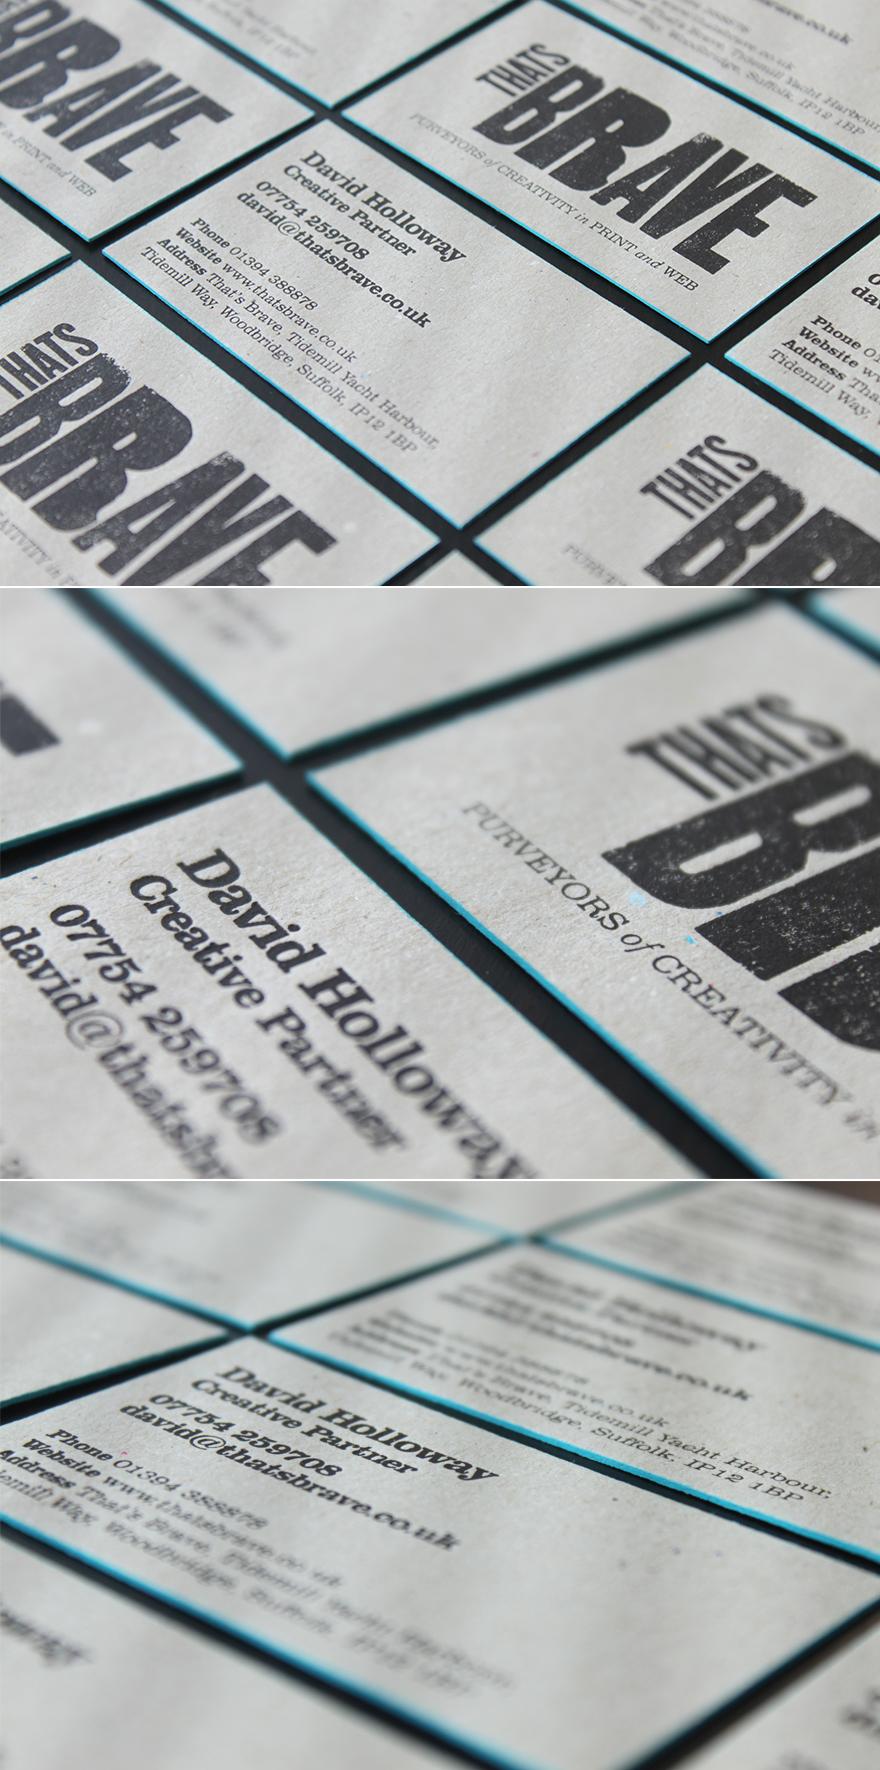 tipografik-kartvizit-tasarim